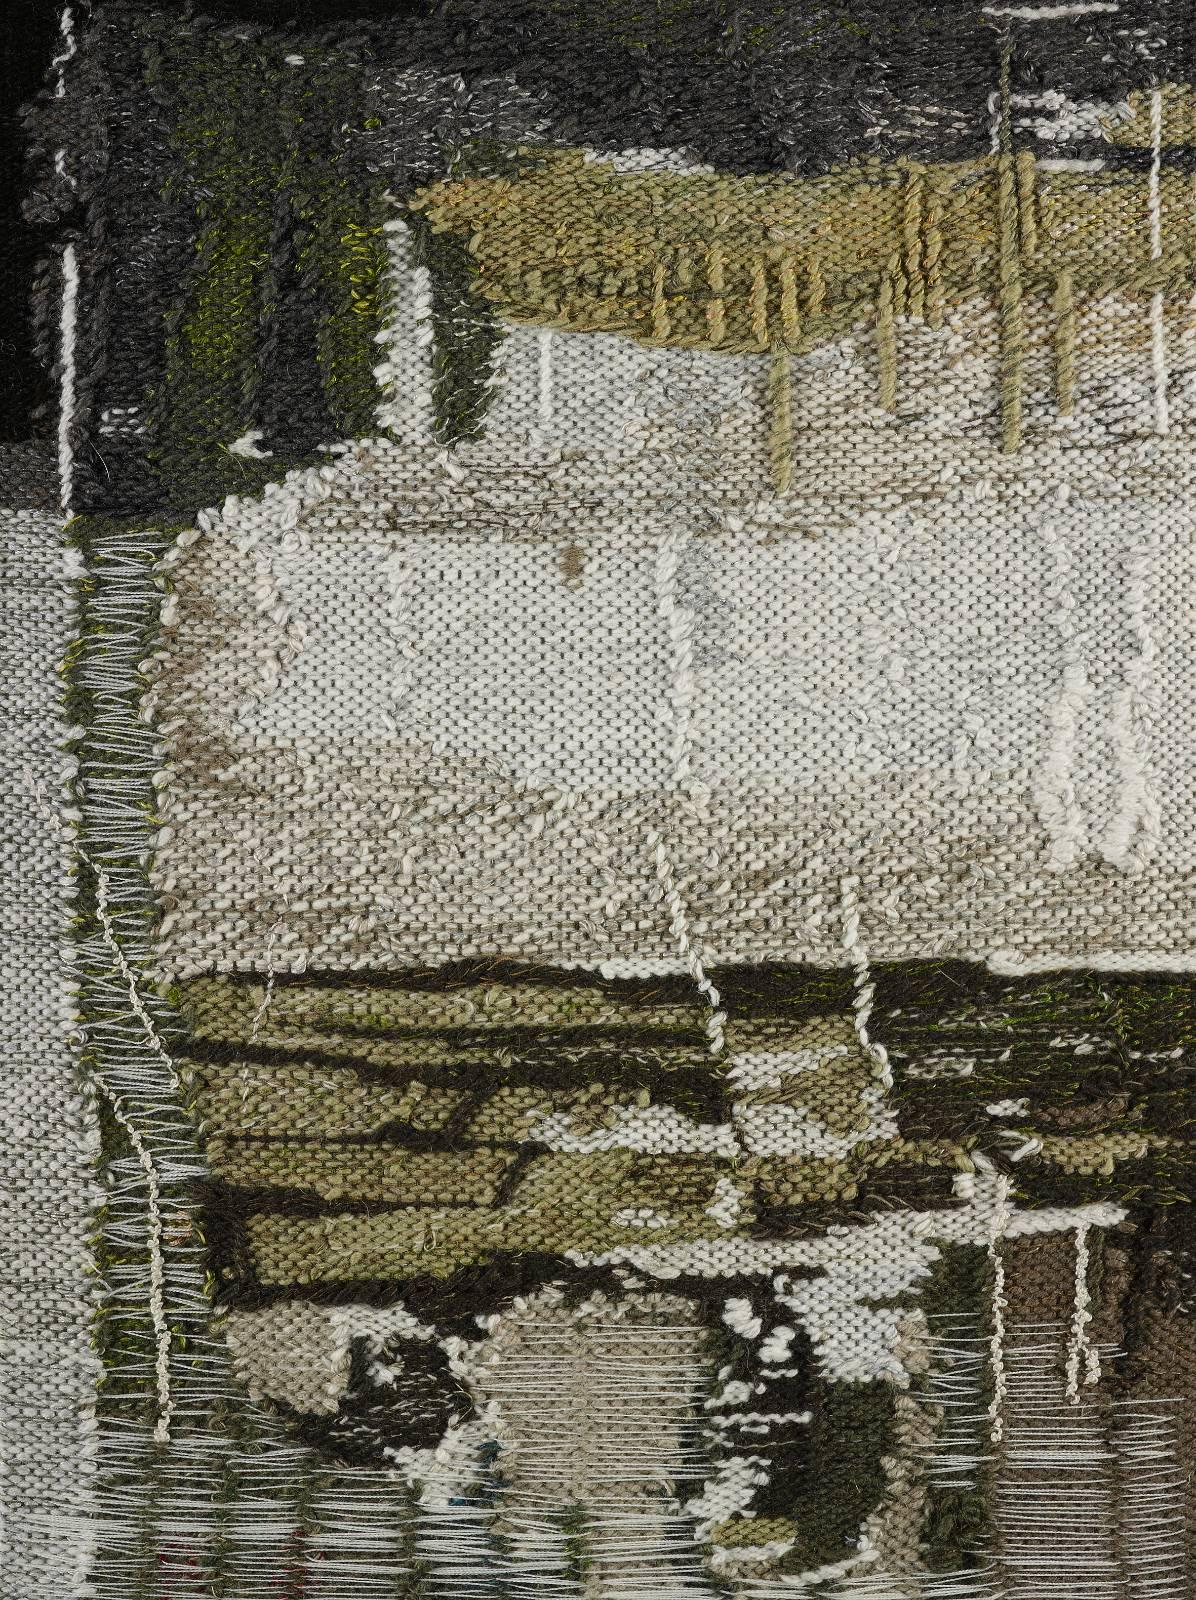 Untitled, 2012, cotton warp, wool thread, plywood, 60 x 44 cm